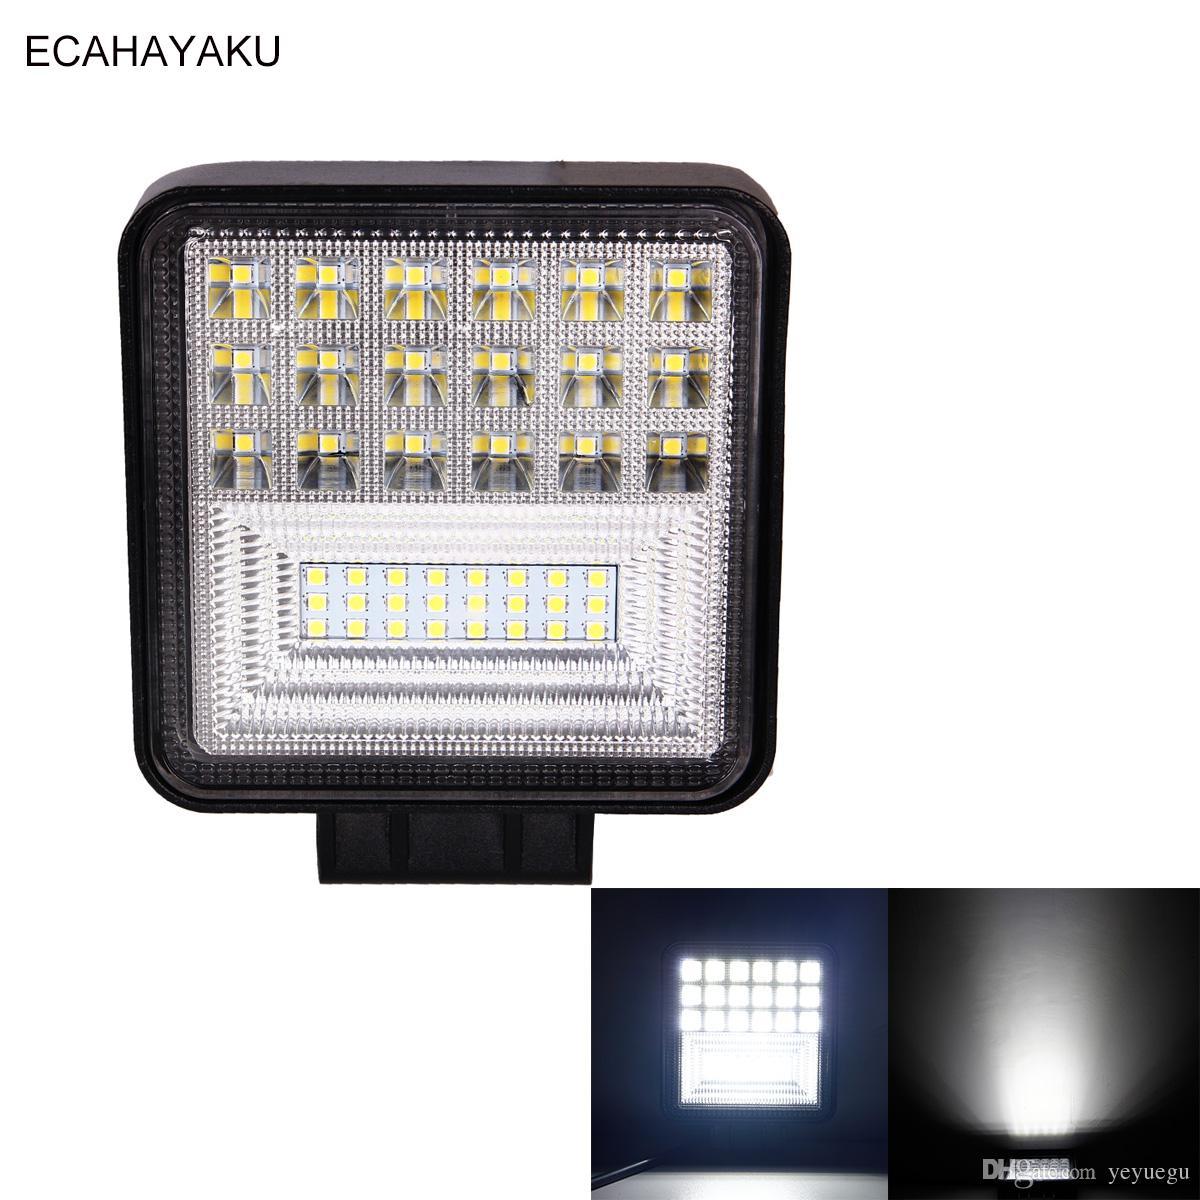 ECAHAYAKU 1Pcs 4inch High Power Car Led Work Lamp 126W 6000K White 12V 24V for OffRoad 4x4 Heavy-duty Truck Boat Jeep Hummer ATV